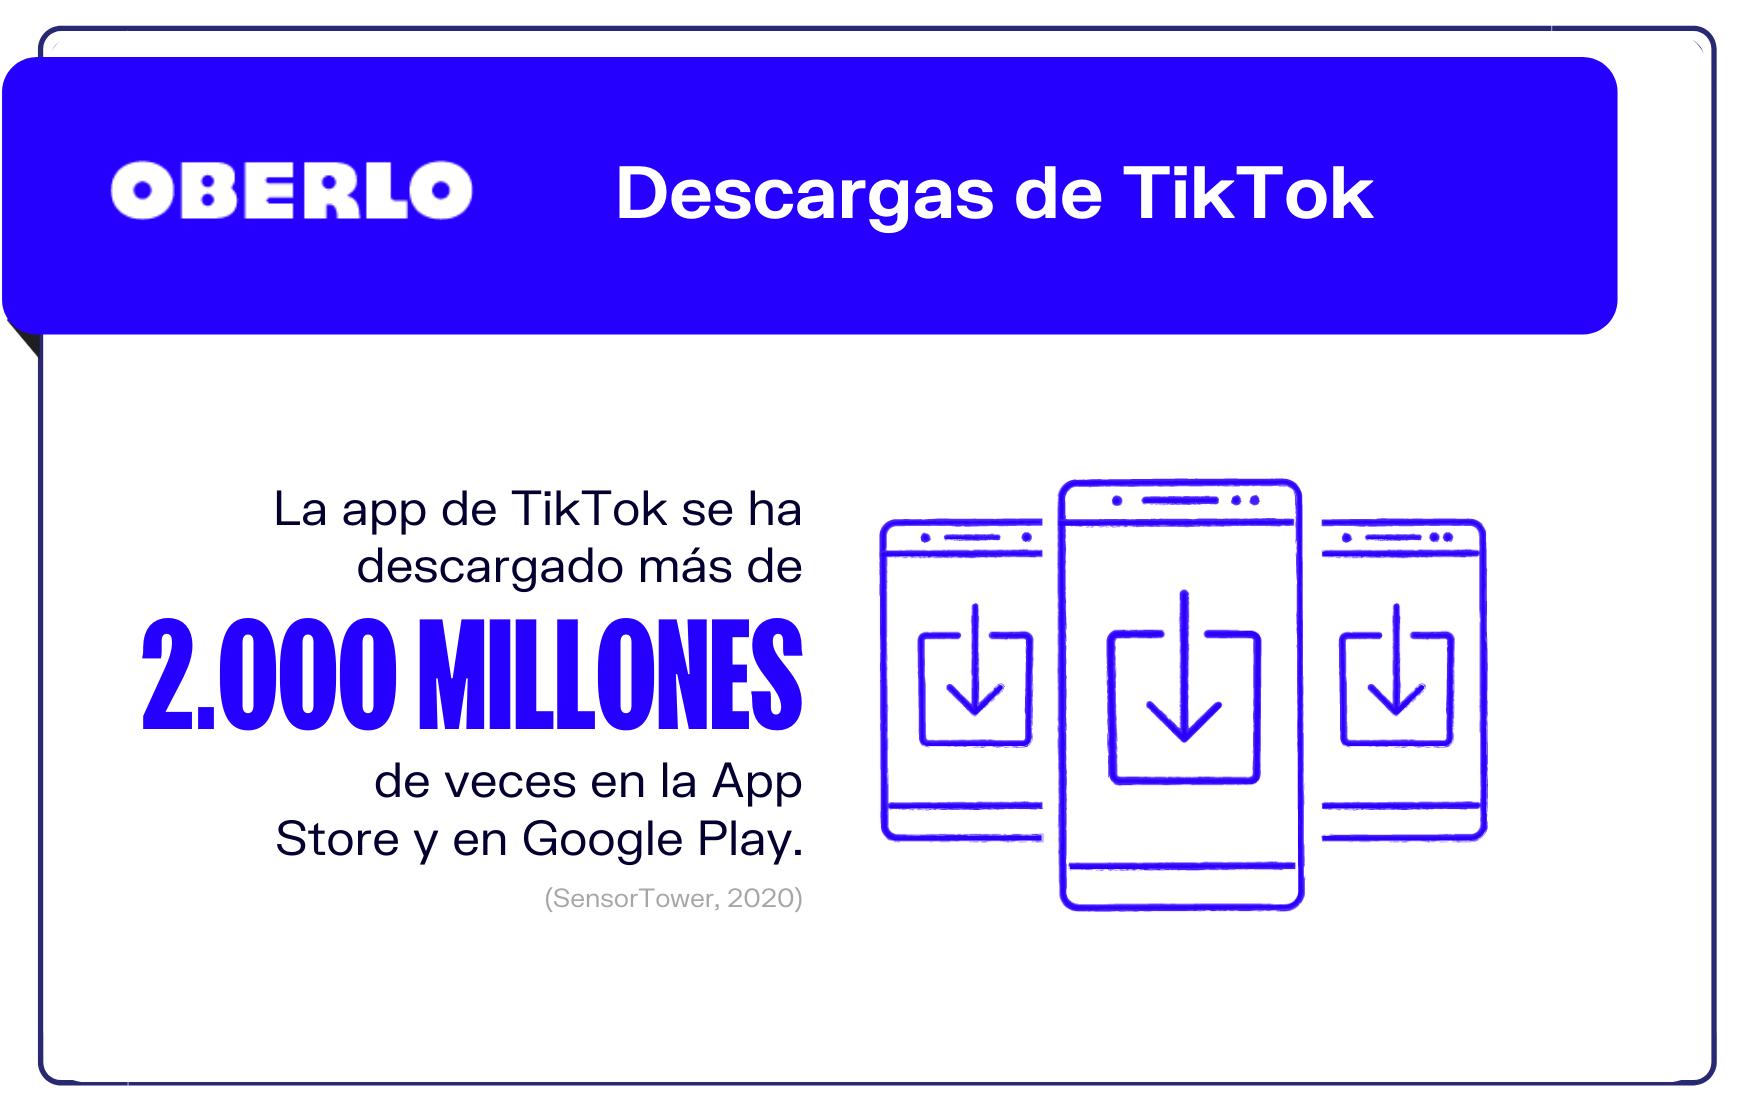 2-Cifras-de-descargas-de-TikTok